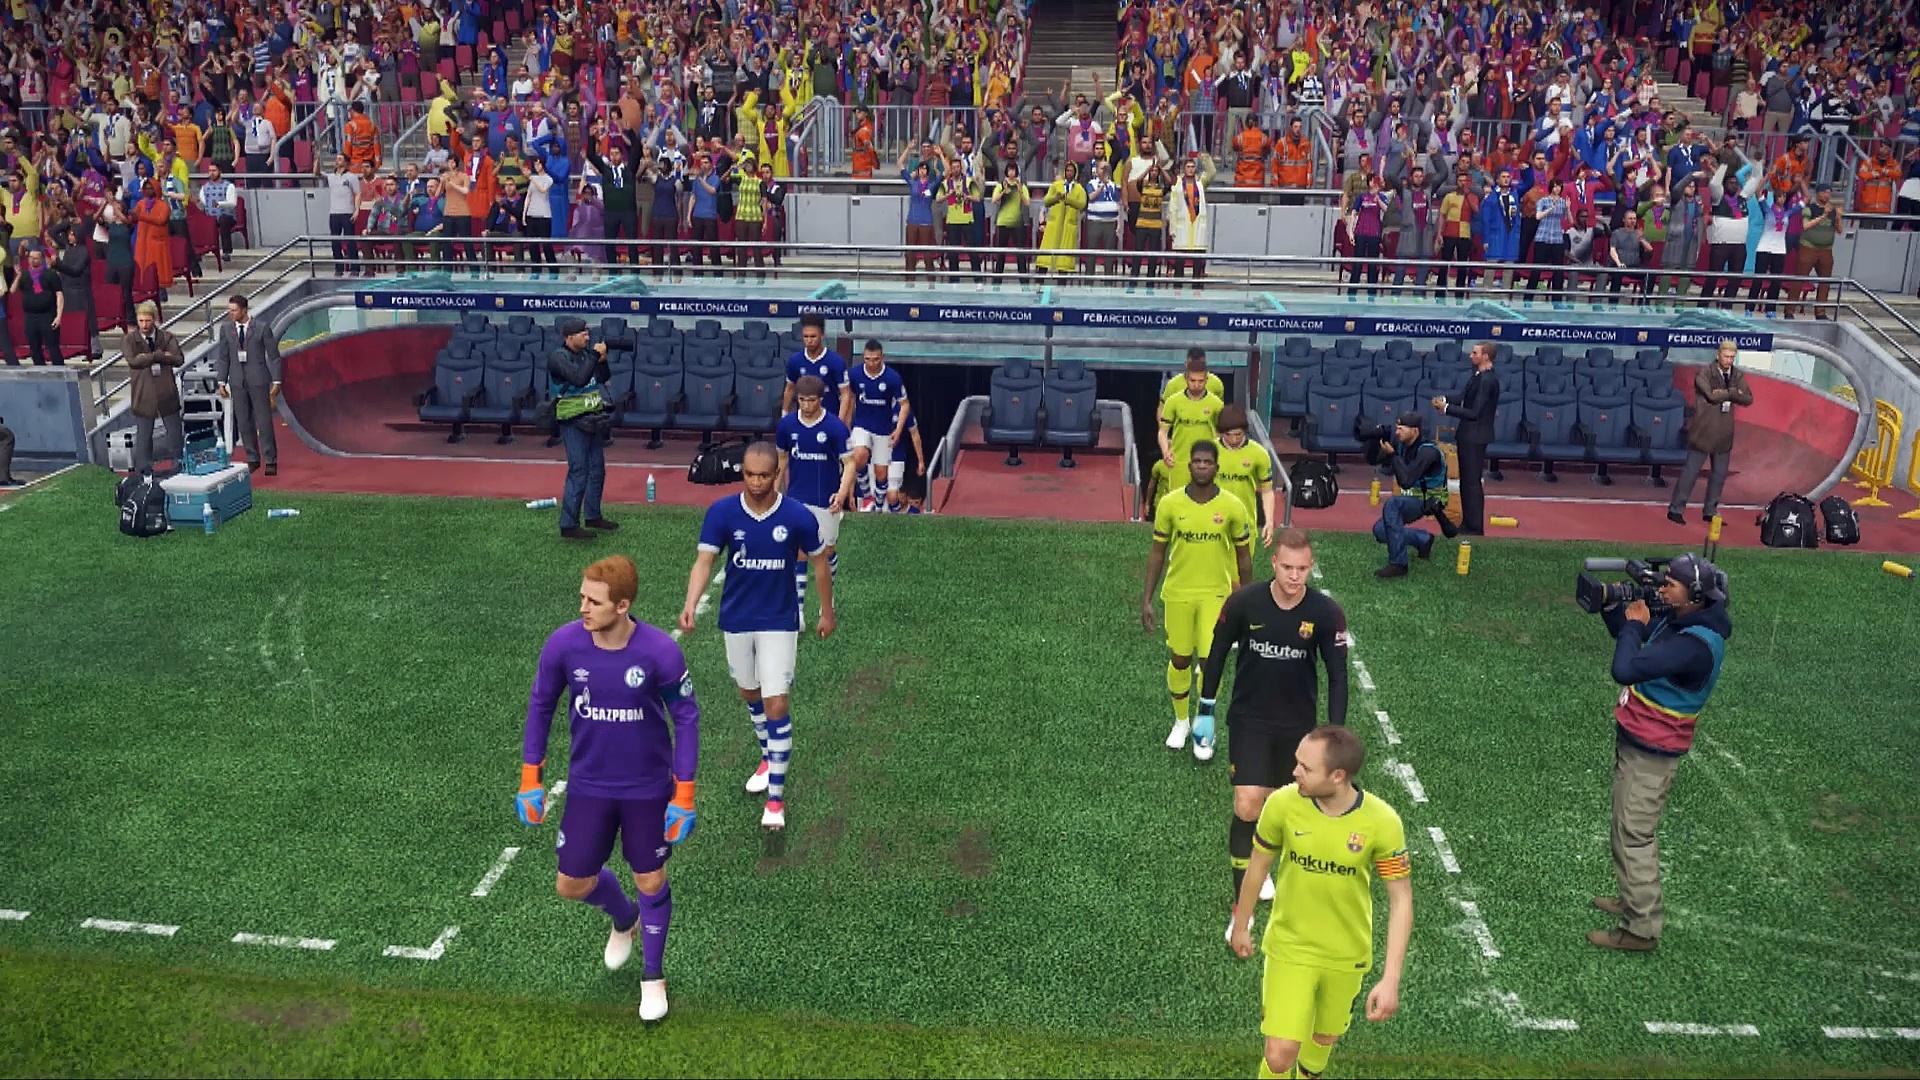 PES 2019 PC Barcelona-Schalke 04 demo